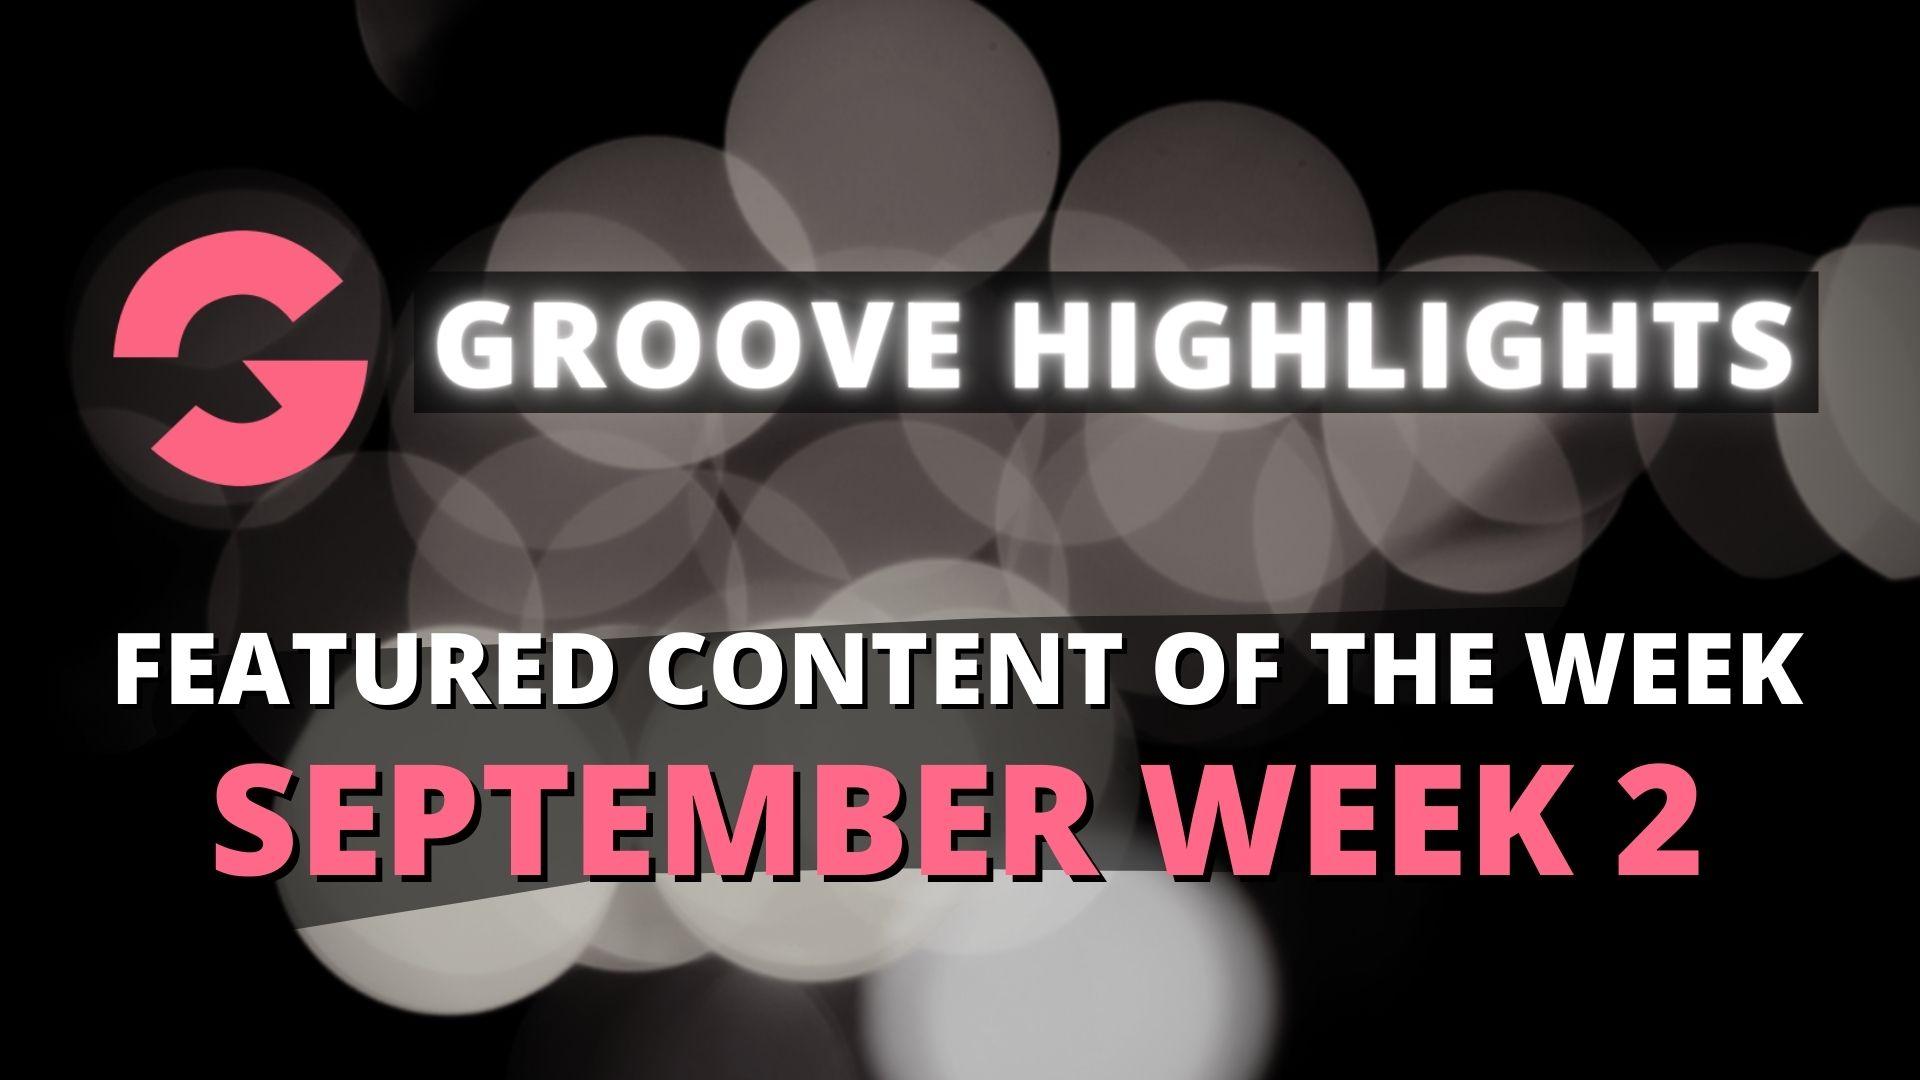 groove highlights september week 2